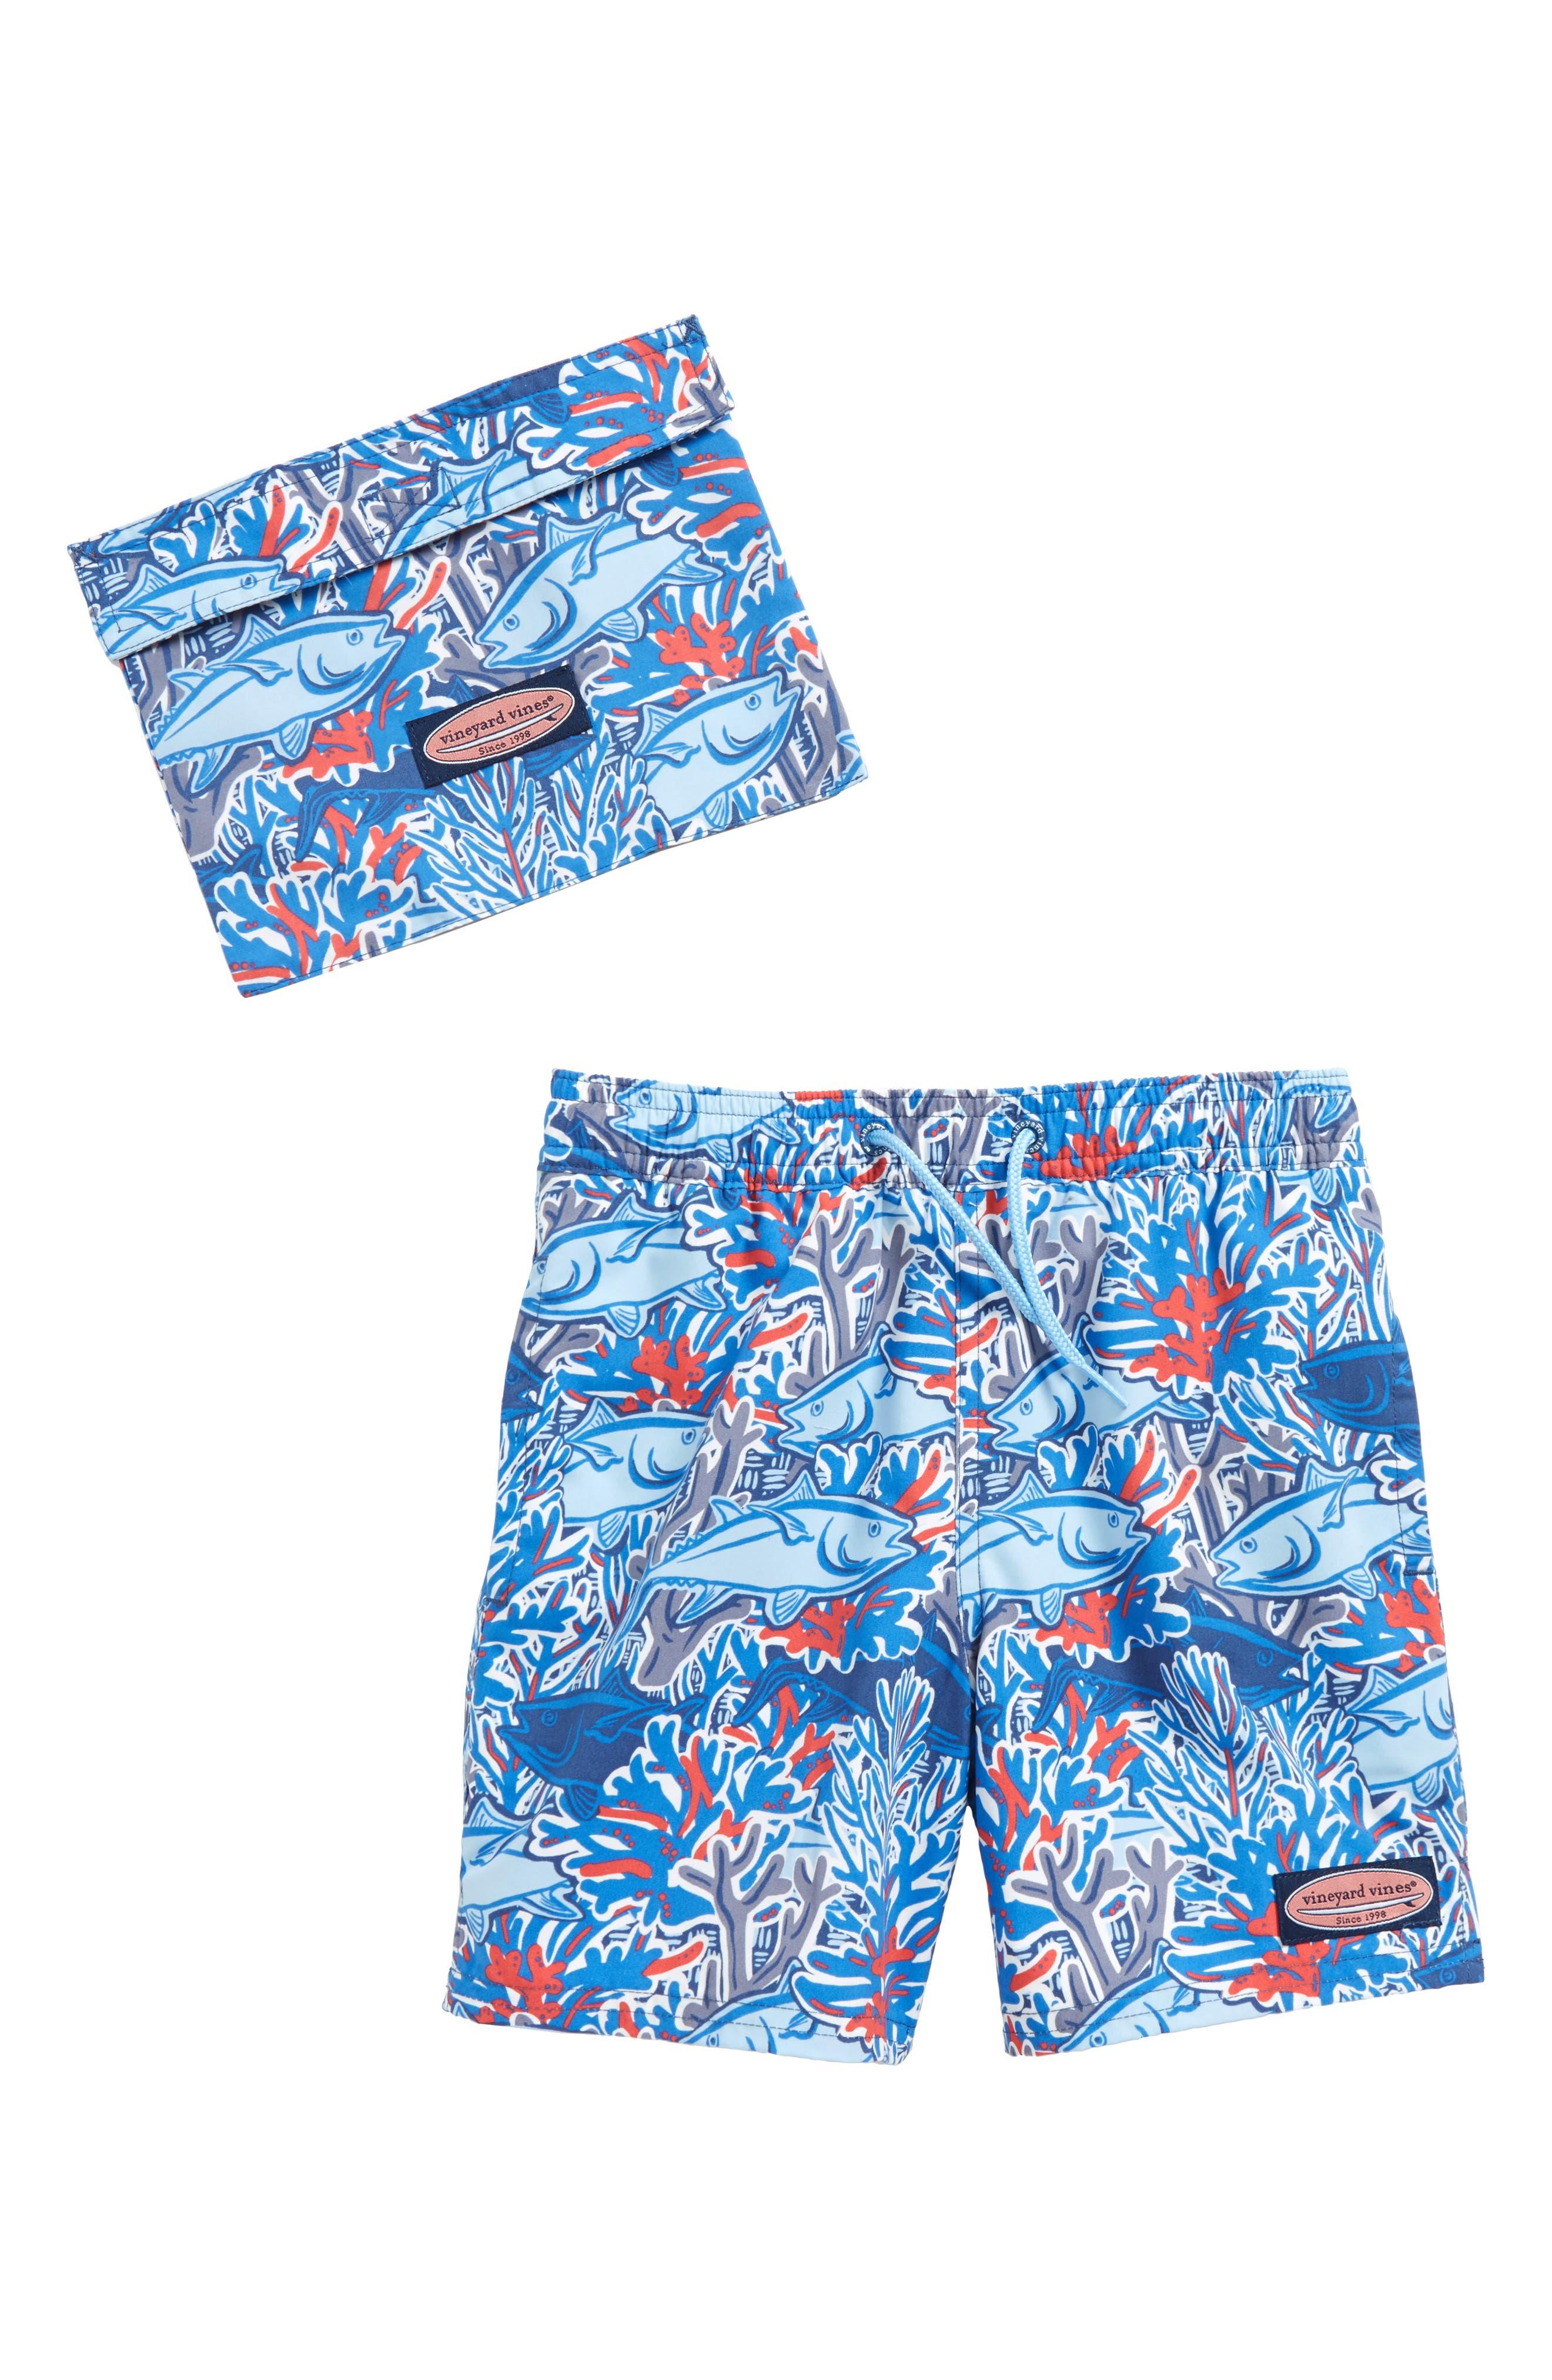 Chappy Tuna in Coral Swim Trunks,                         Main,                         color, Moonshine